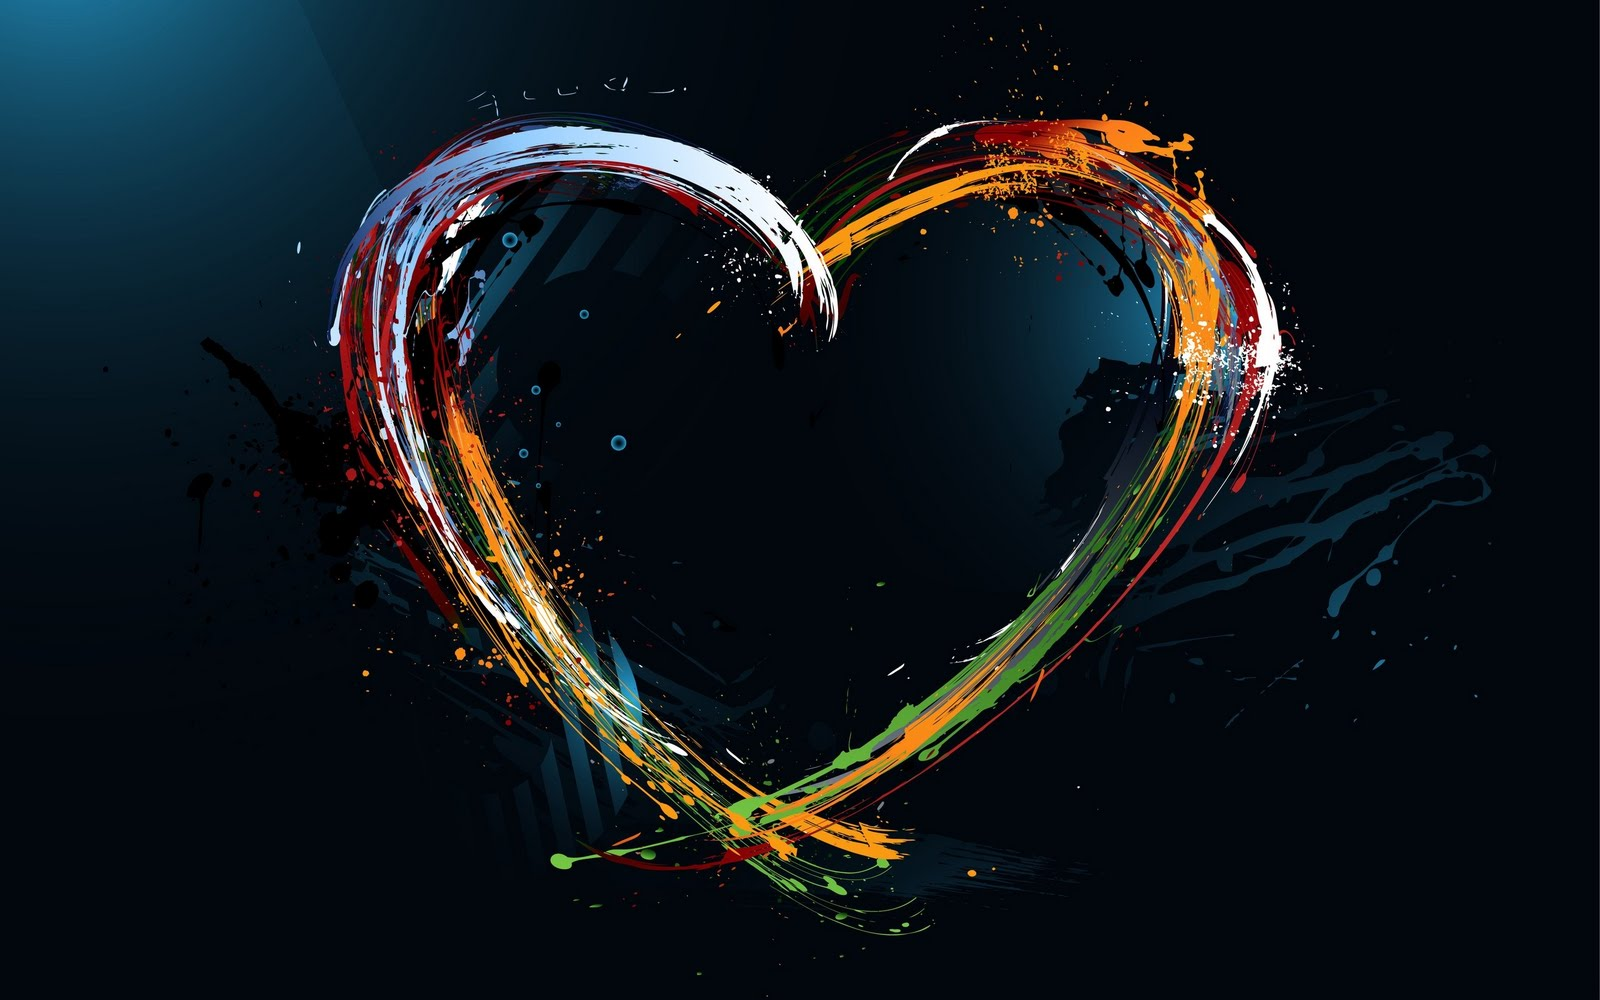 Desktop Hd Wallpapers Top 29 Beautiful Love Heart Wallpapers In